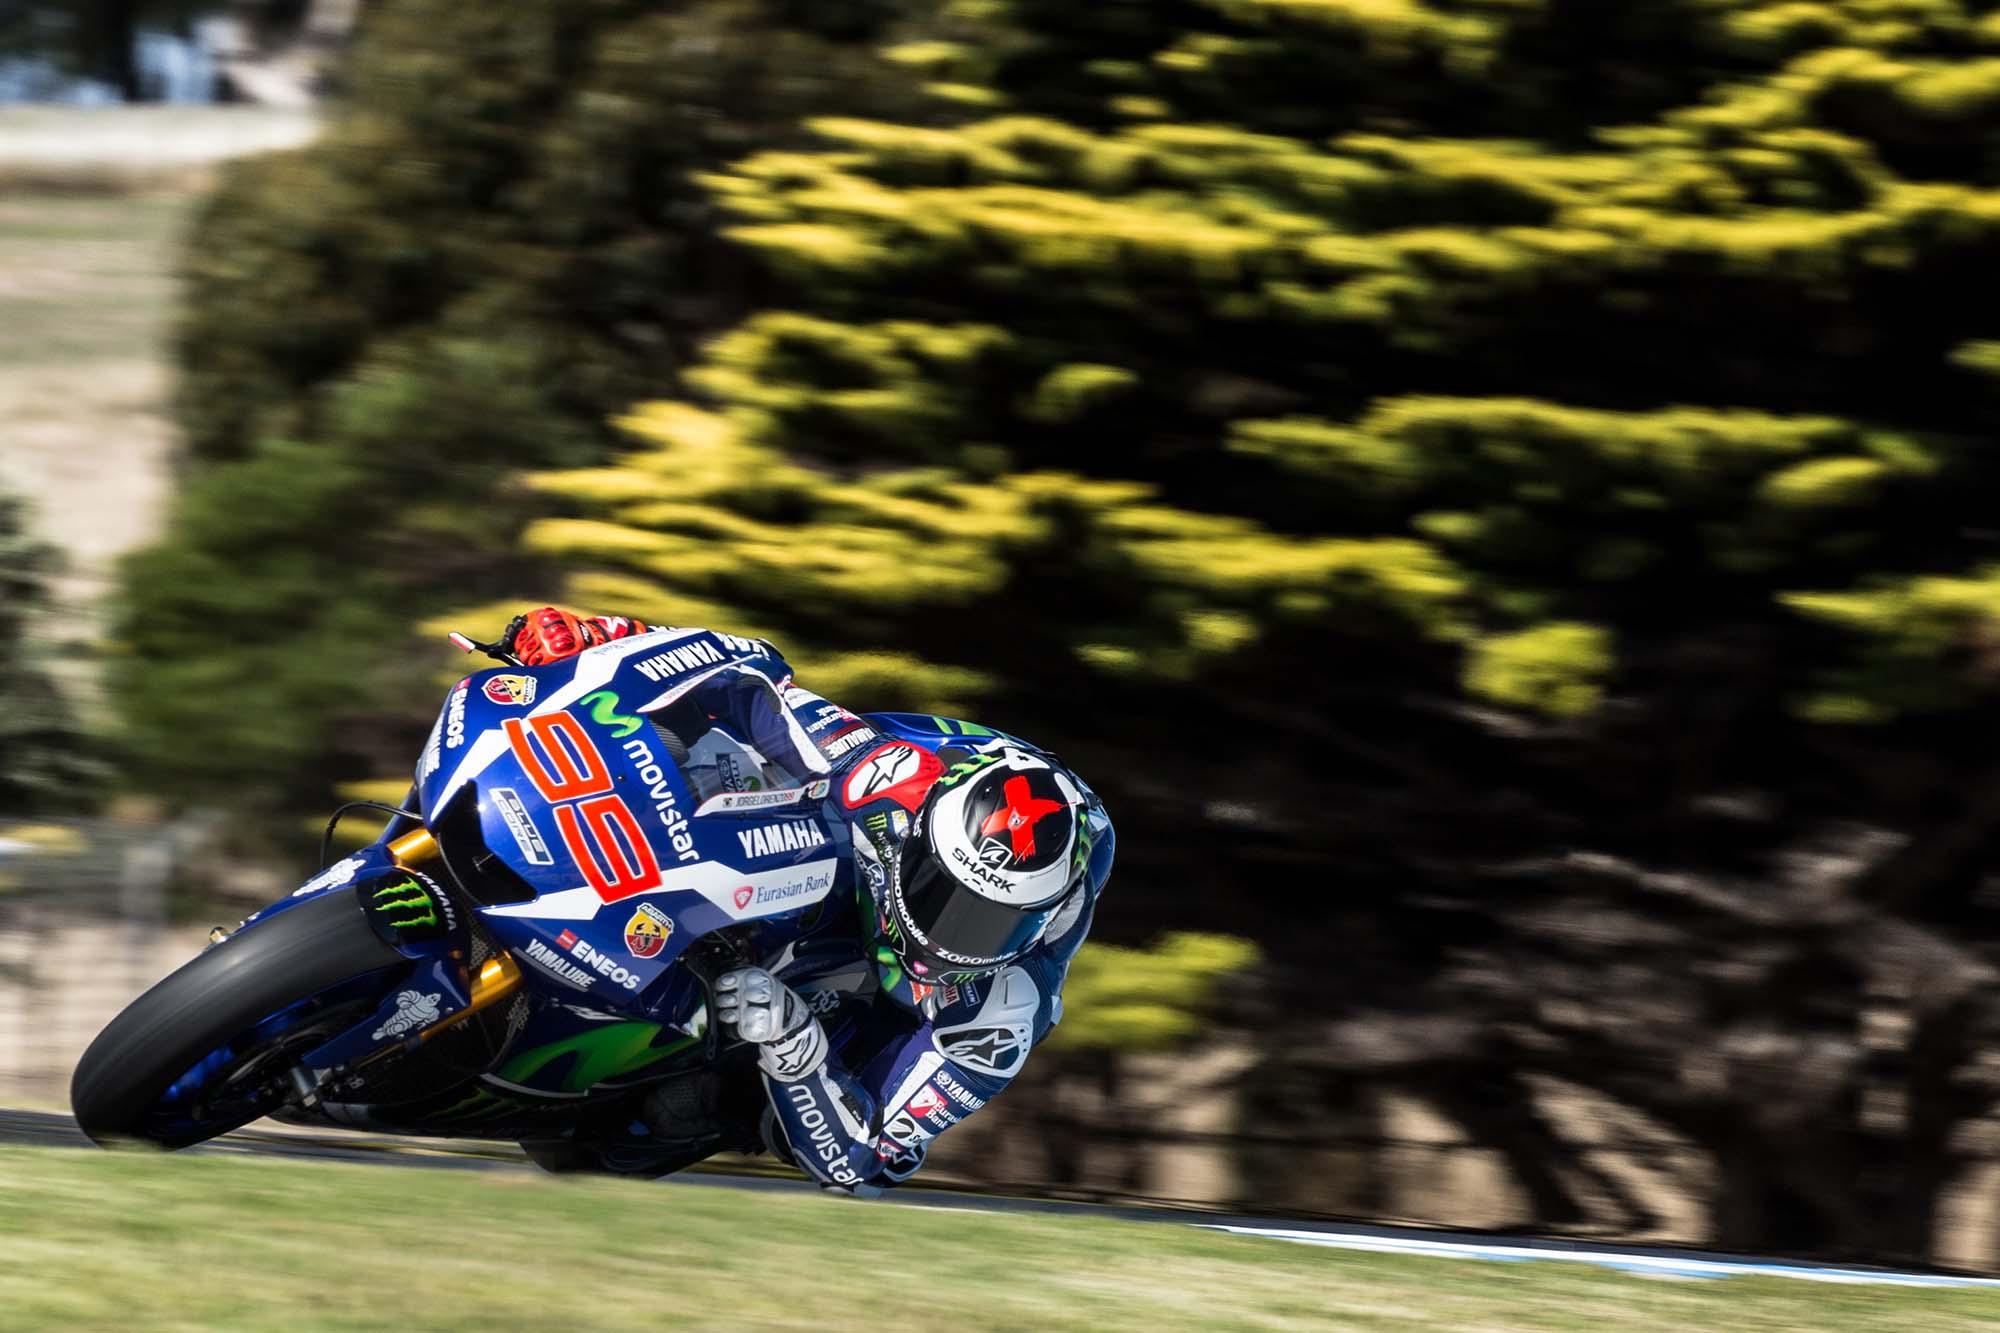 Test MotoGP Phillip Island 2016 - Page 2 MotoGP-Phillip-Island-test-Steve-English-16